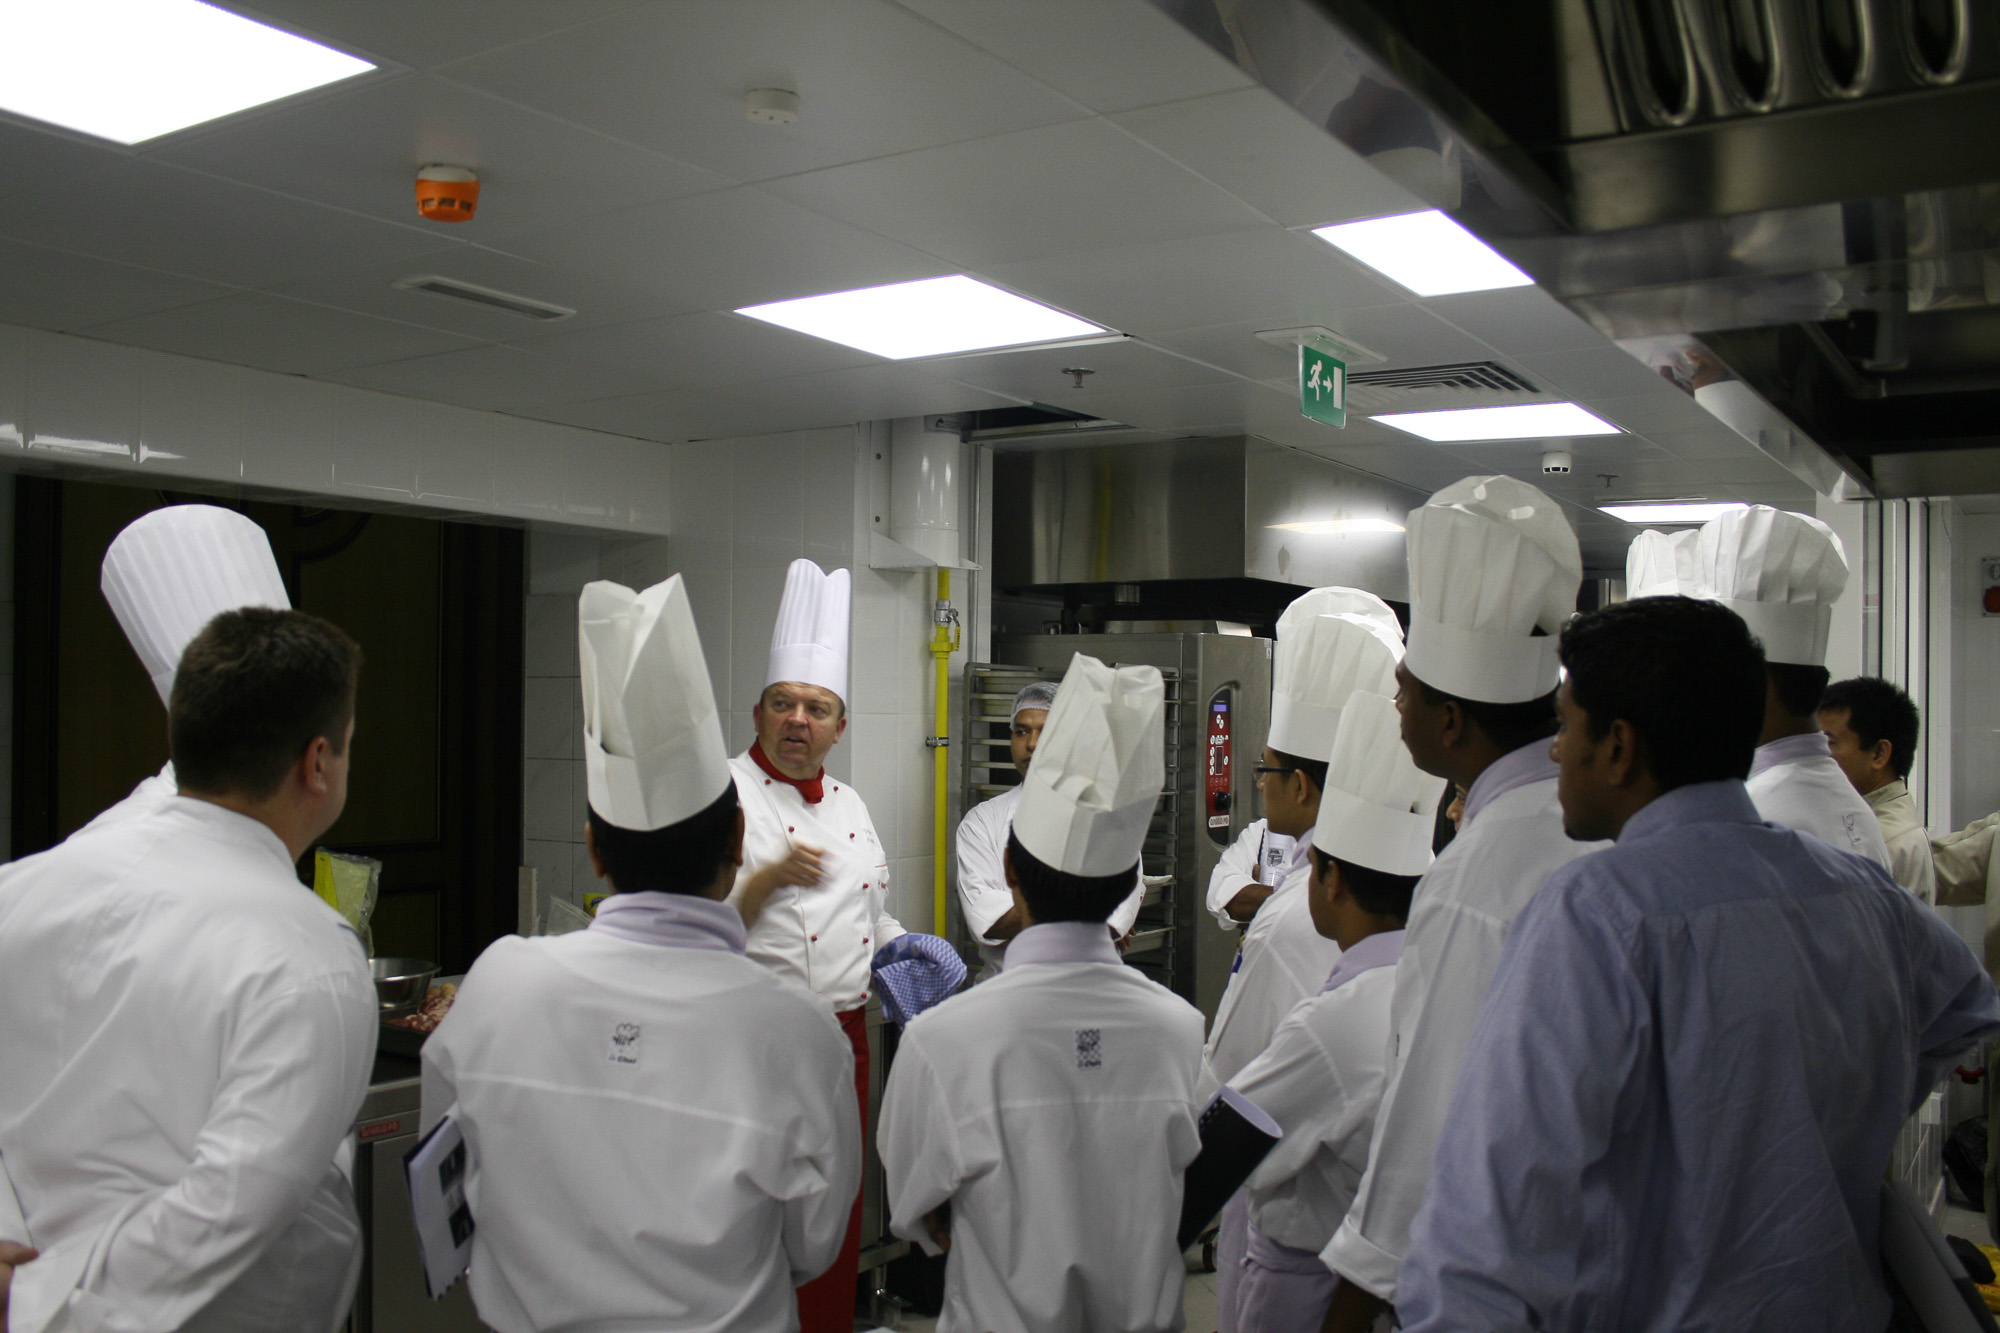 Italia_kitchen_-le_meridien_r-2